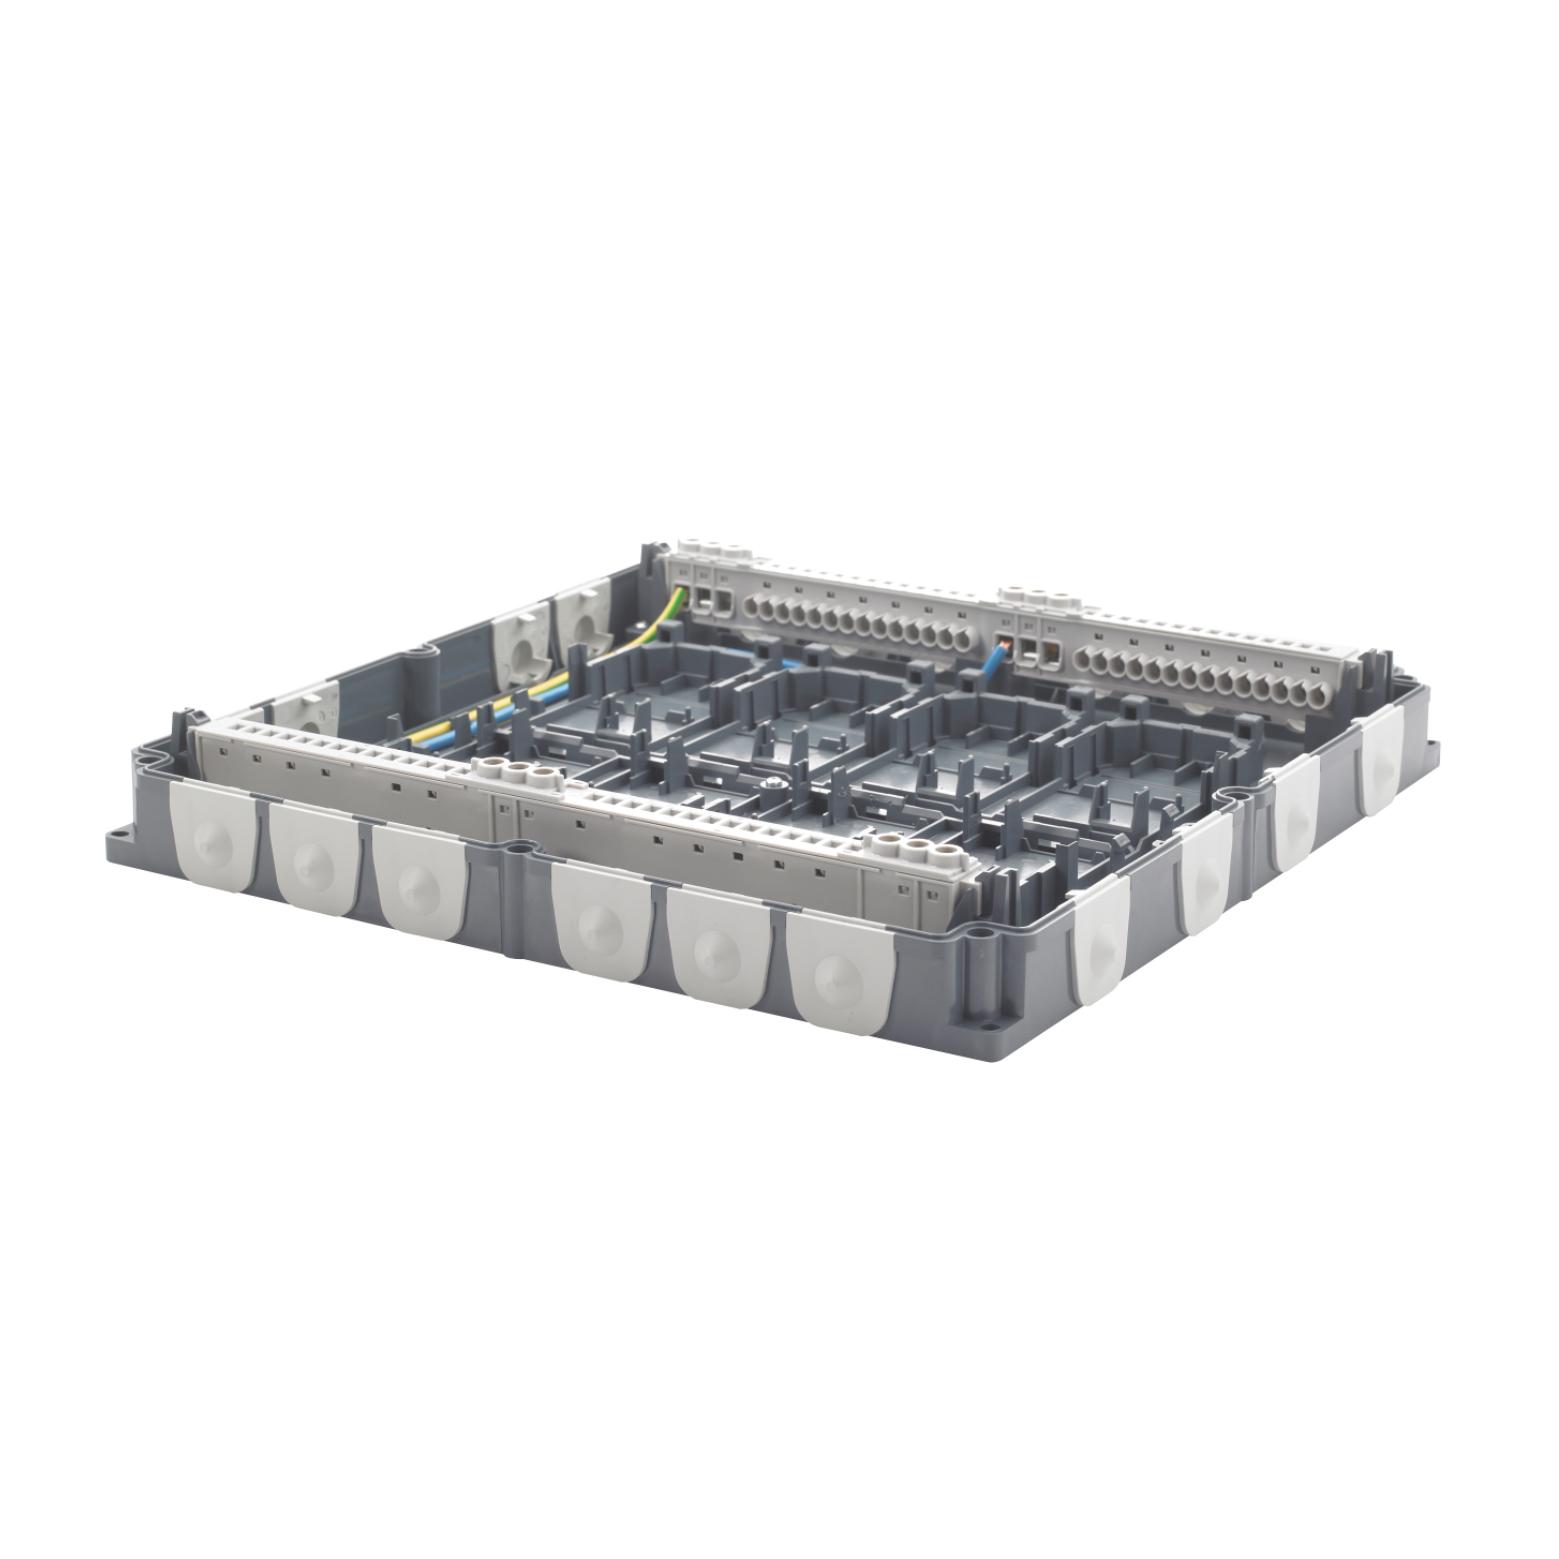 1 Stk Raumautomationsbox, 8 Steckplätze für Module Typ RS oder RL KX6413AB01